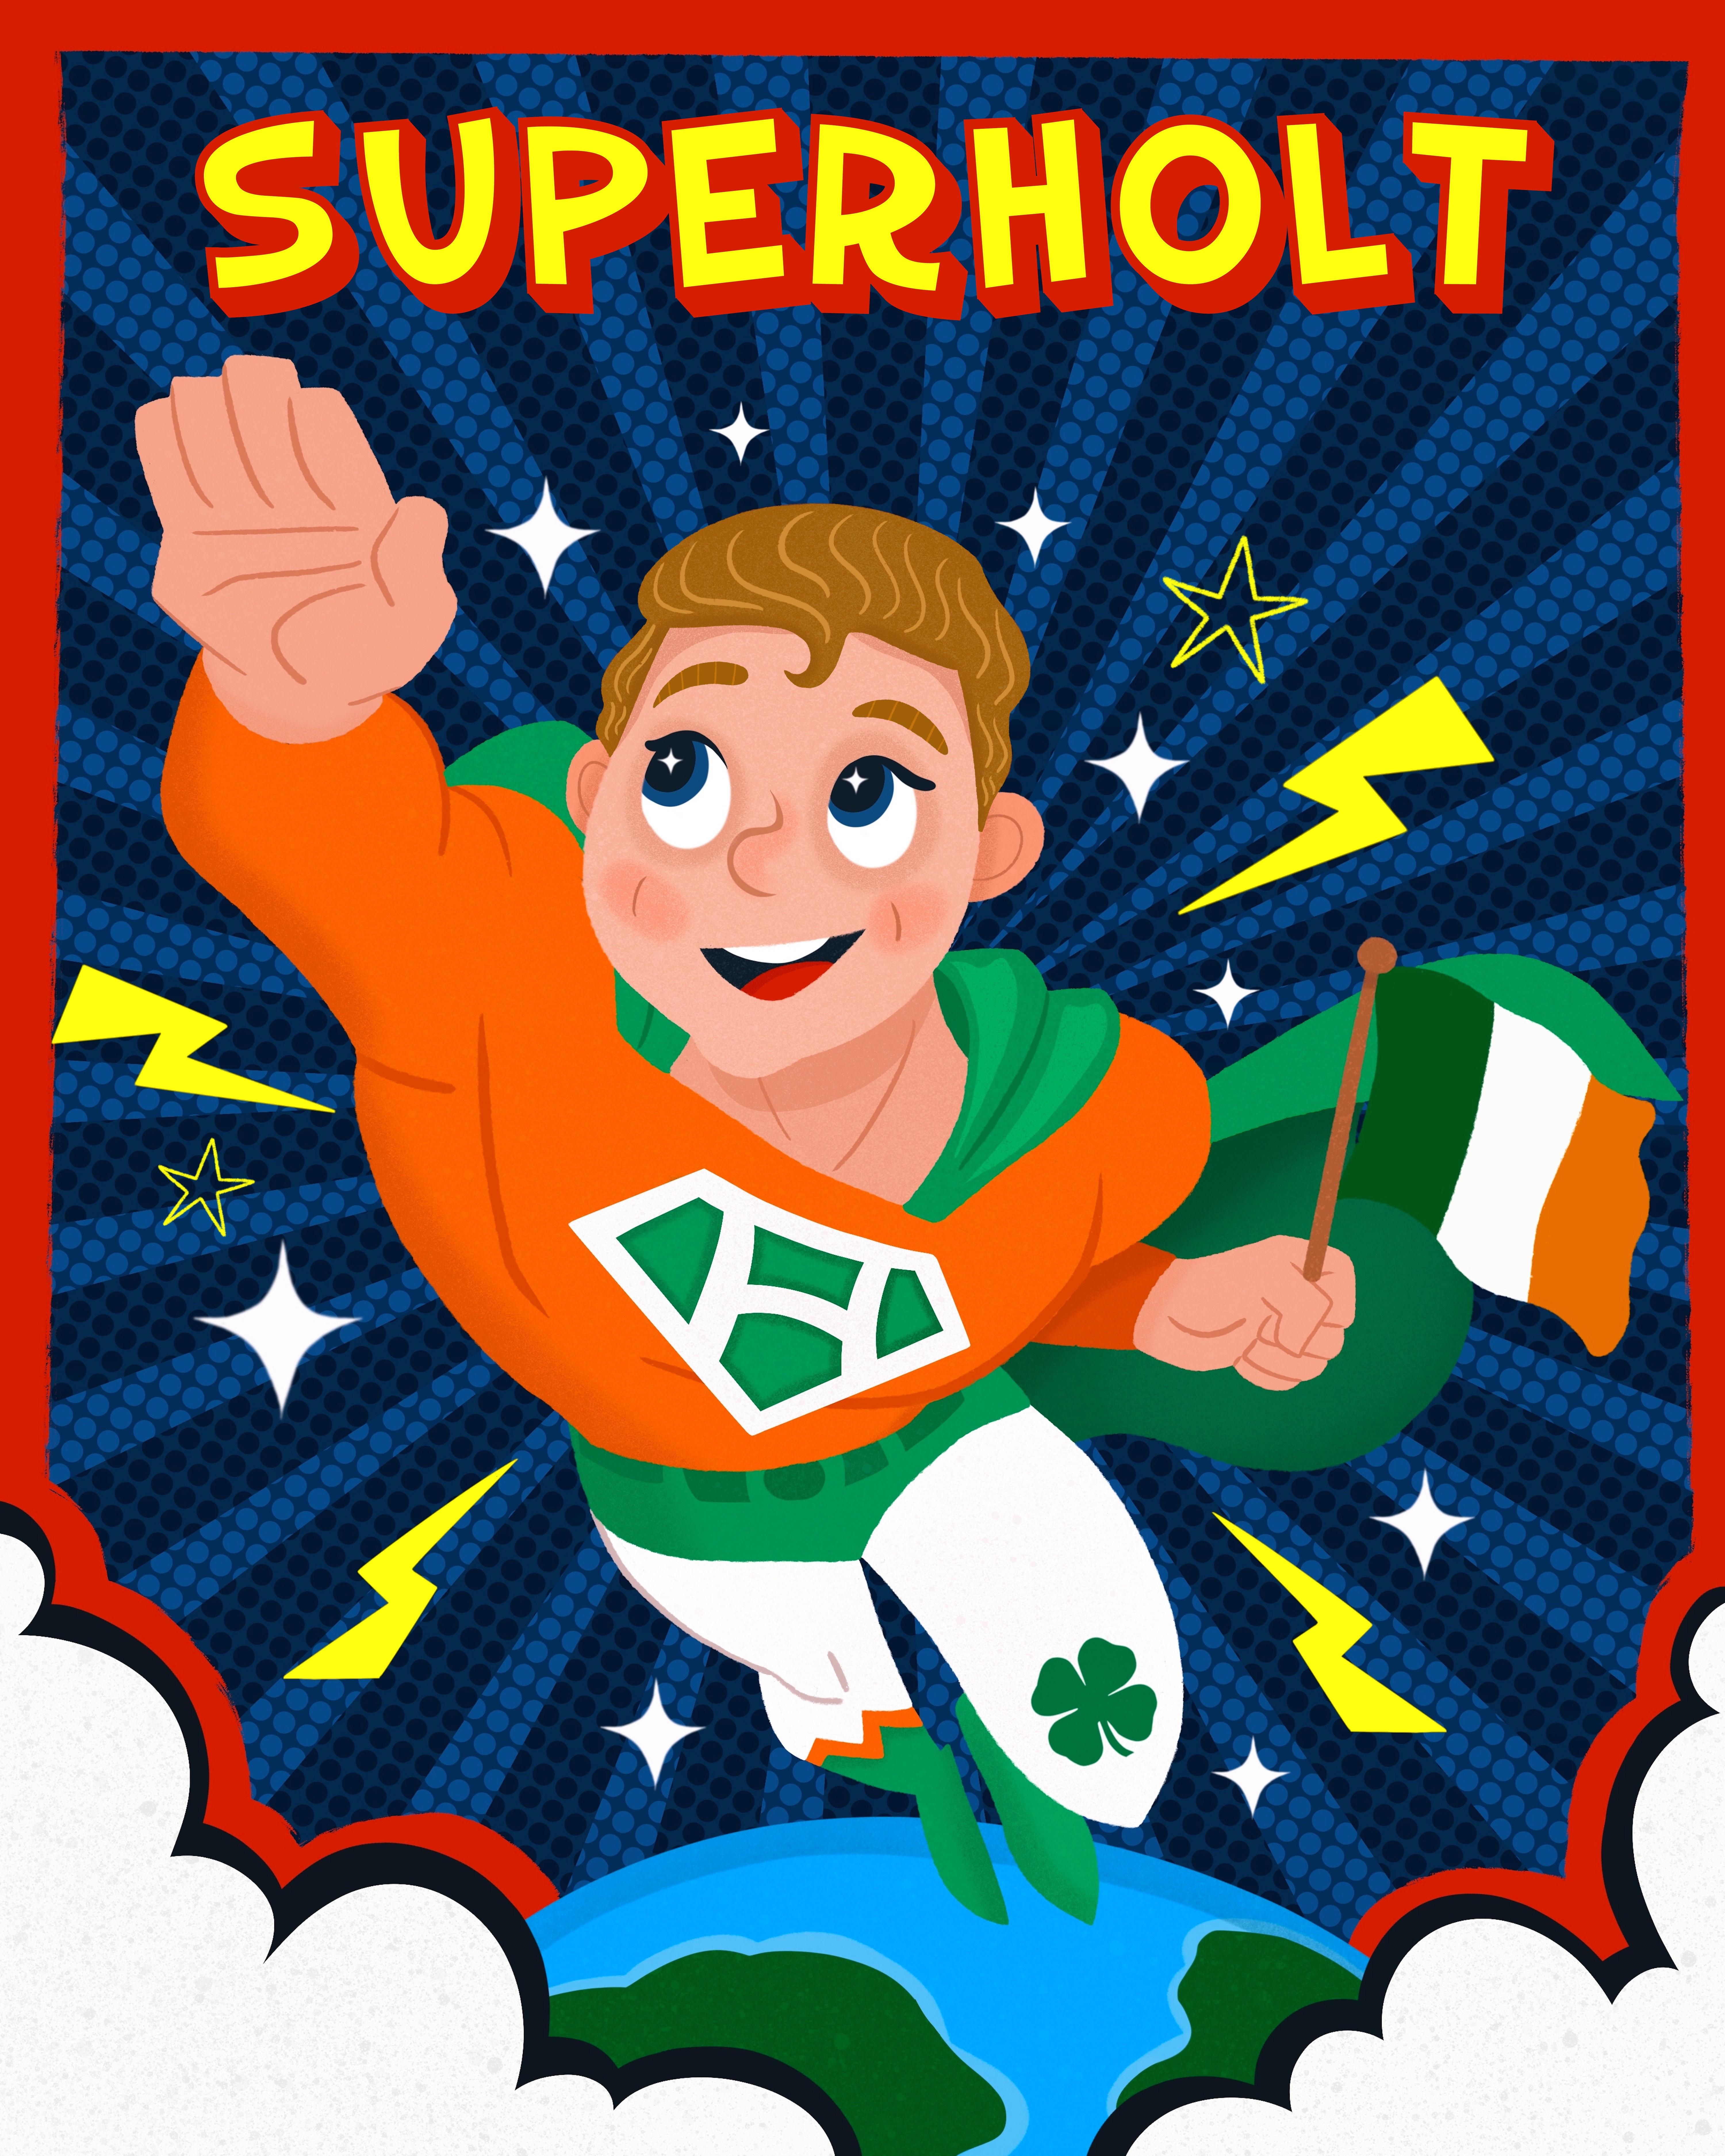 Superholt